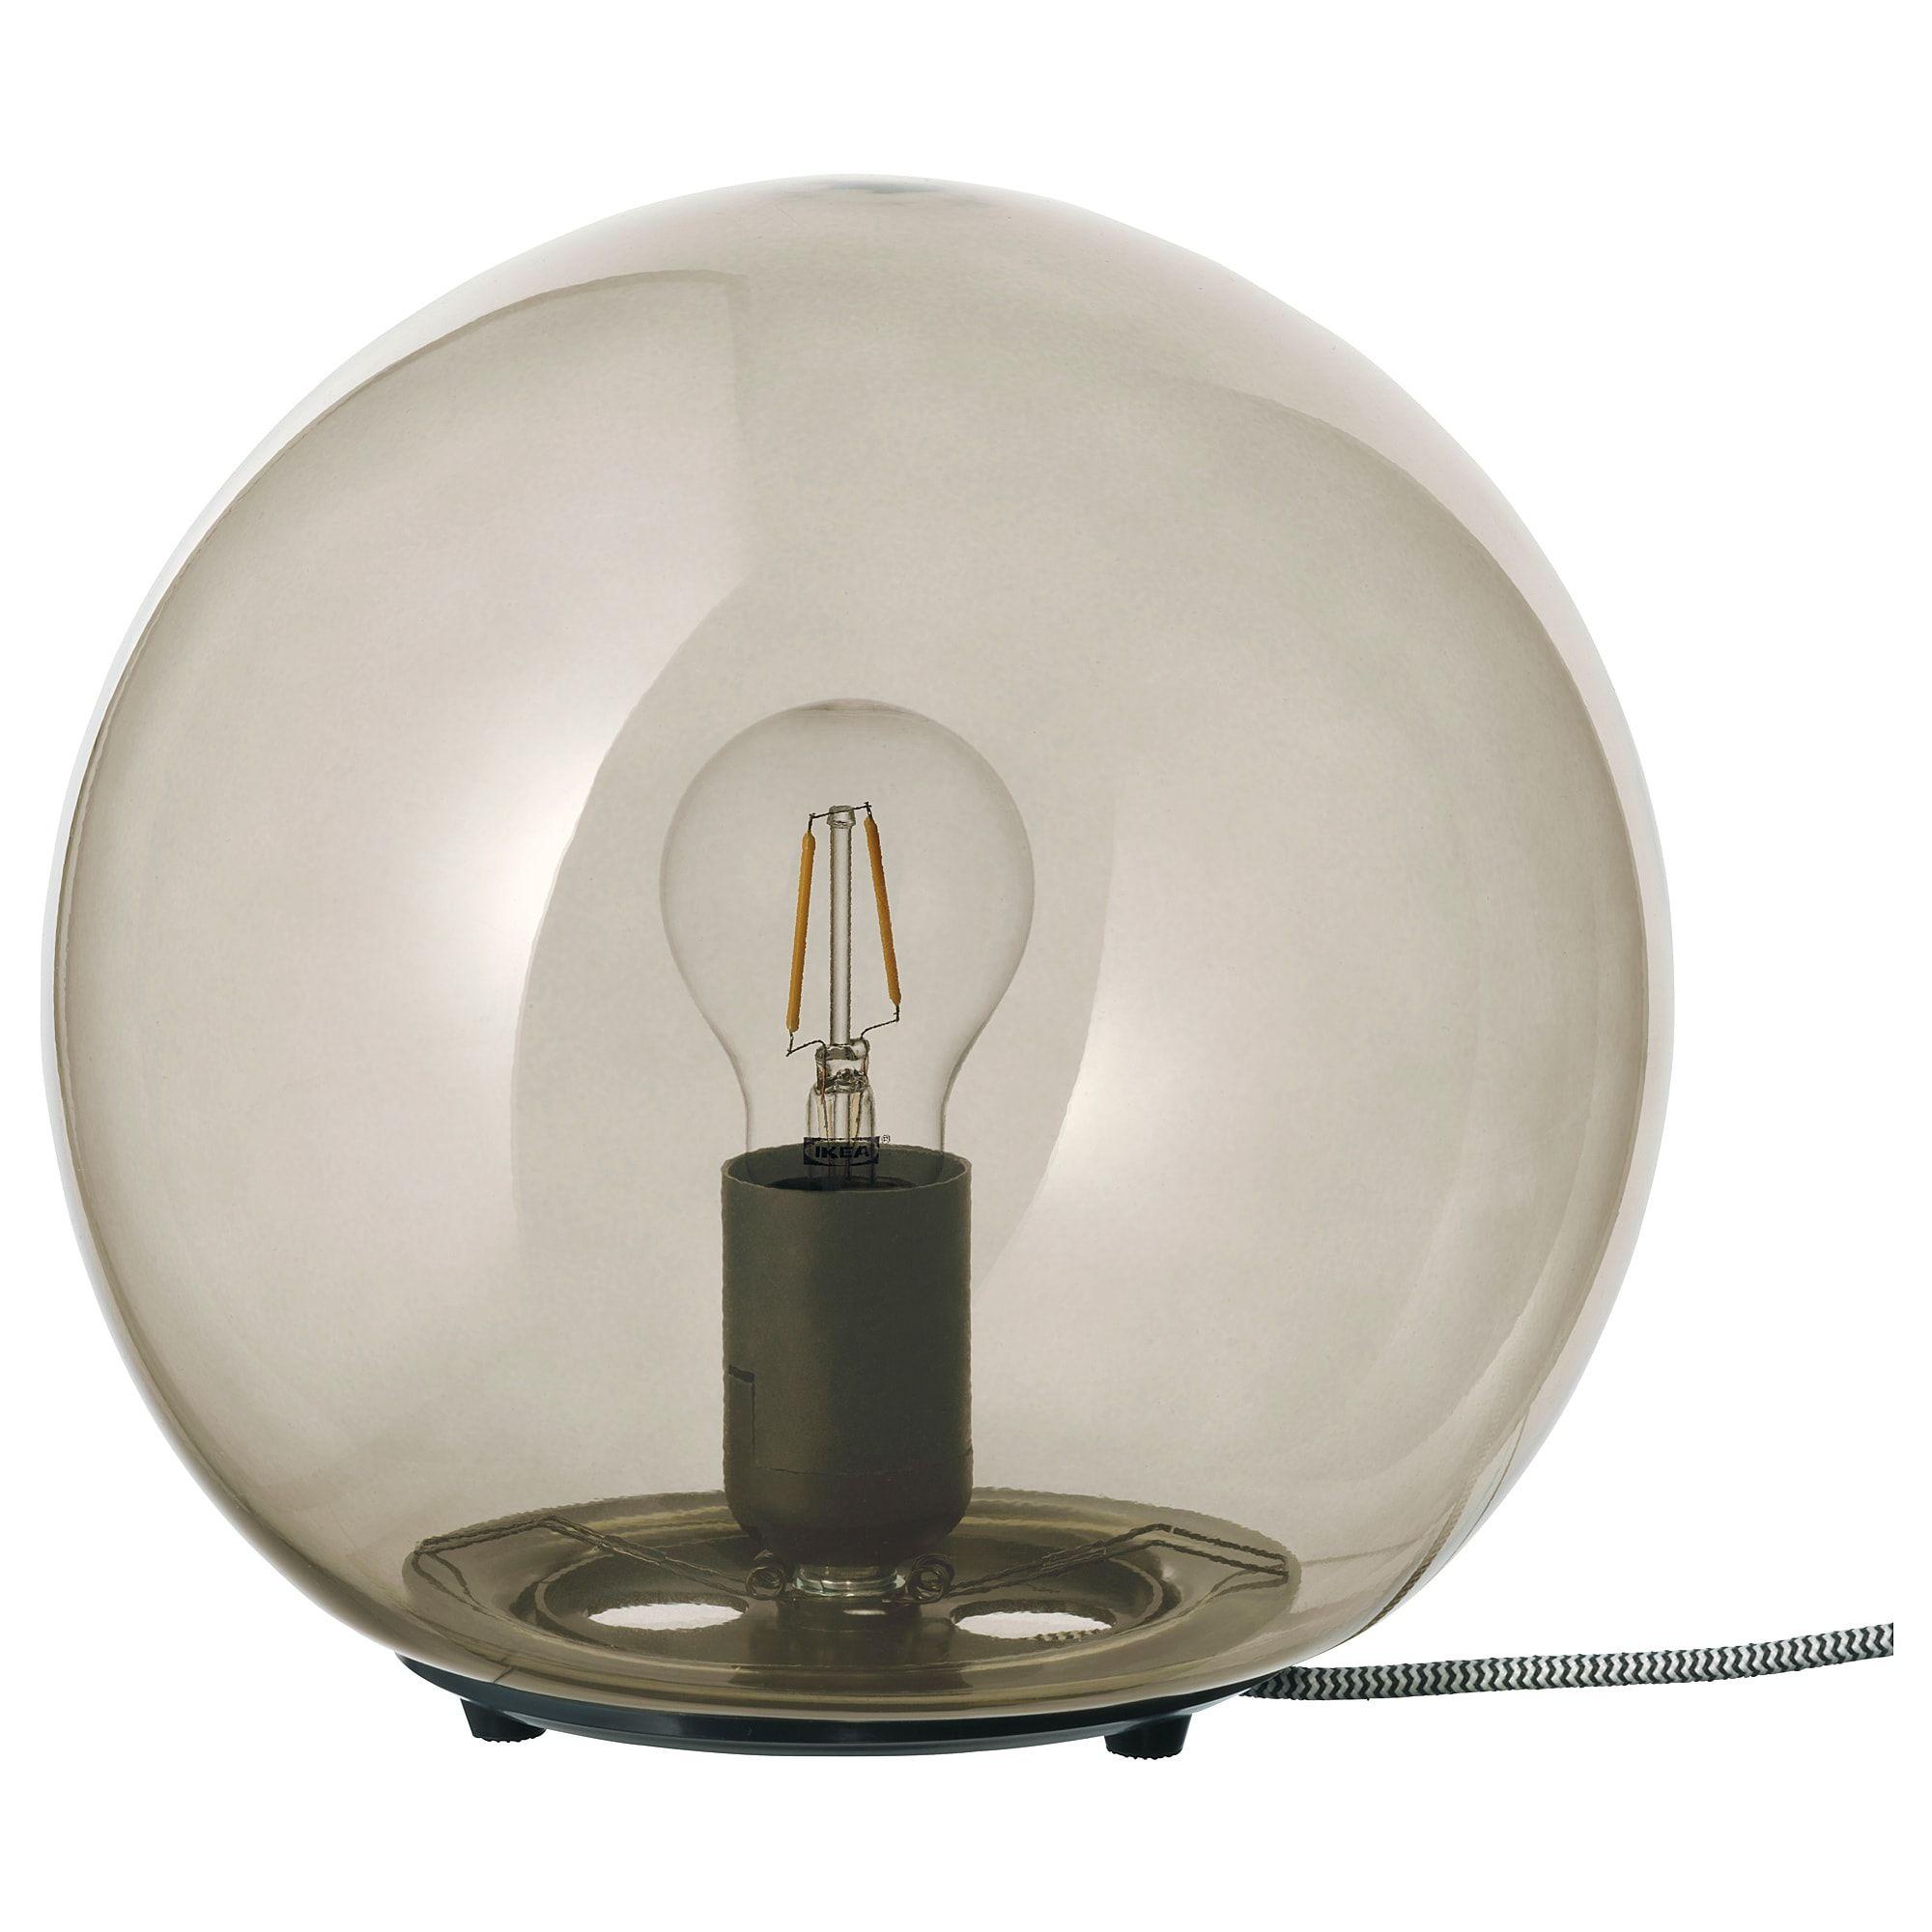 Fado Table Lamp Gray 10 25 Cm Lampes De Table Lampe De Chevet Design